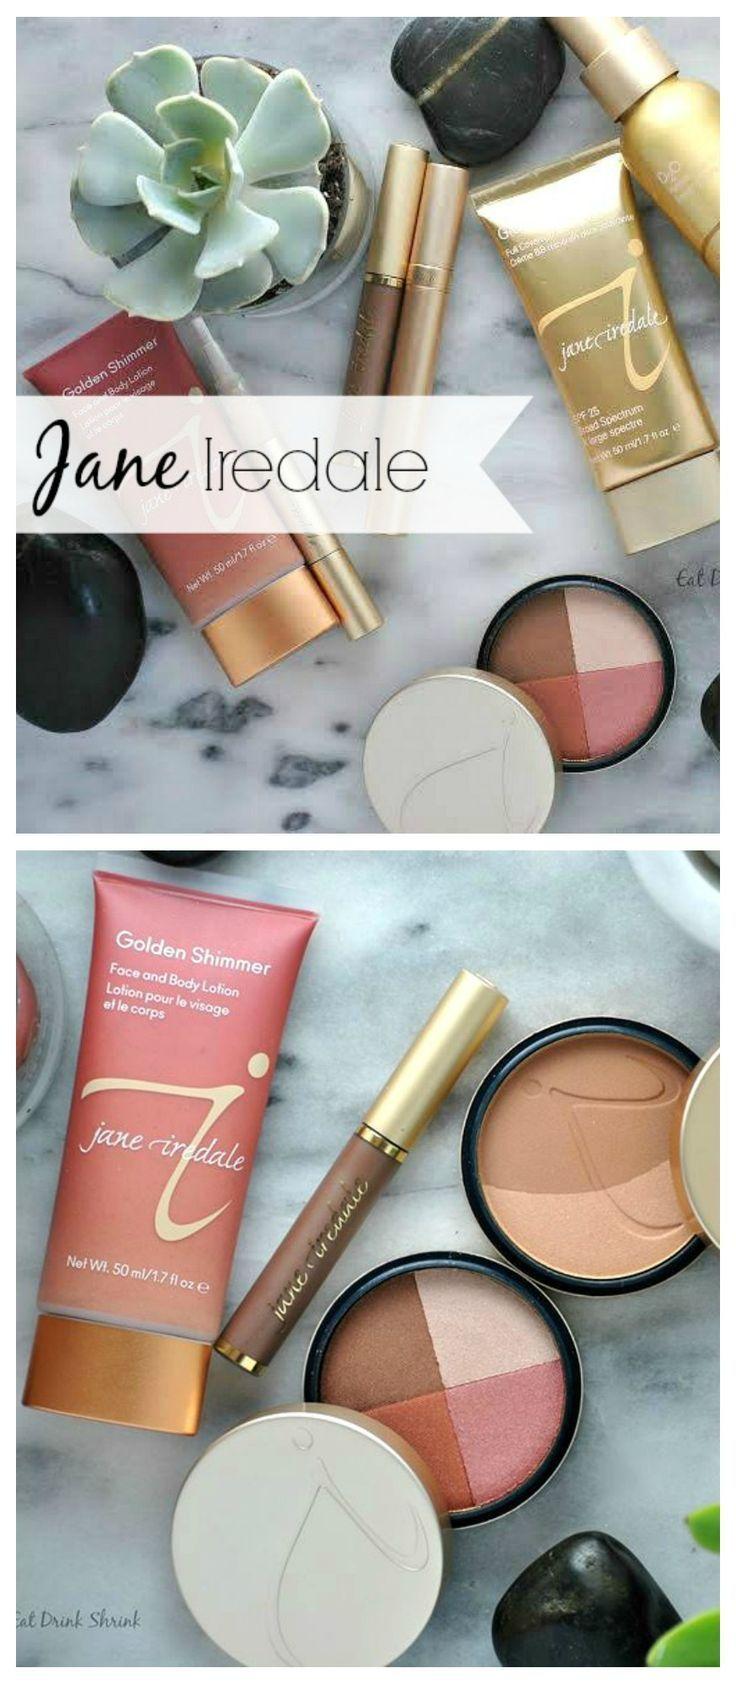 Jane Iredale Cosmetics Review Jane iredale cosmetics